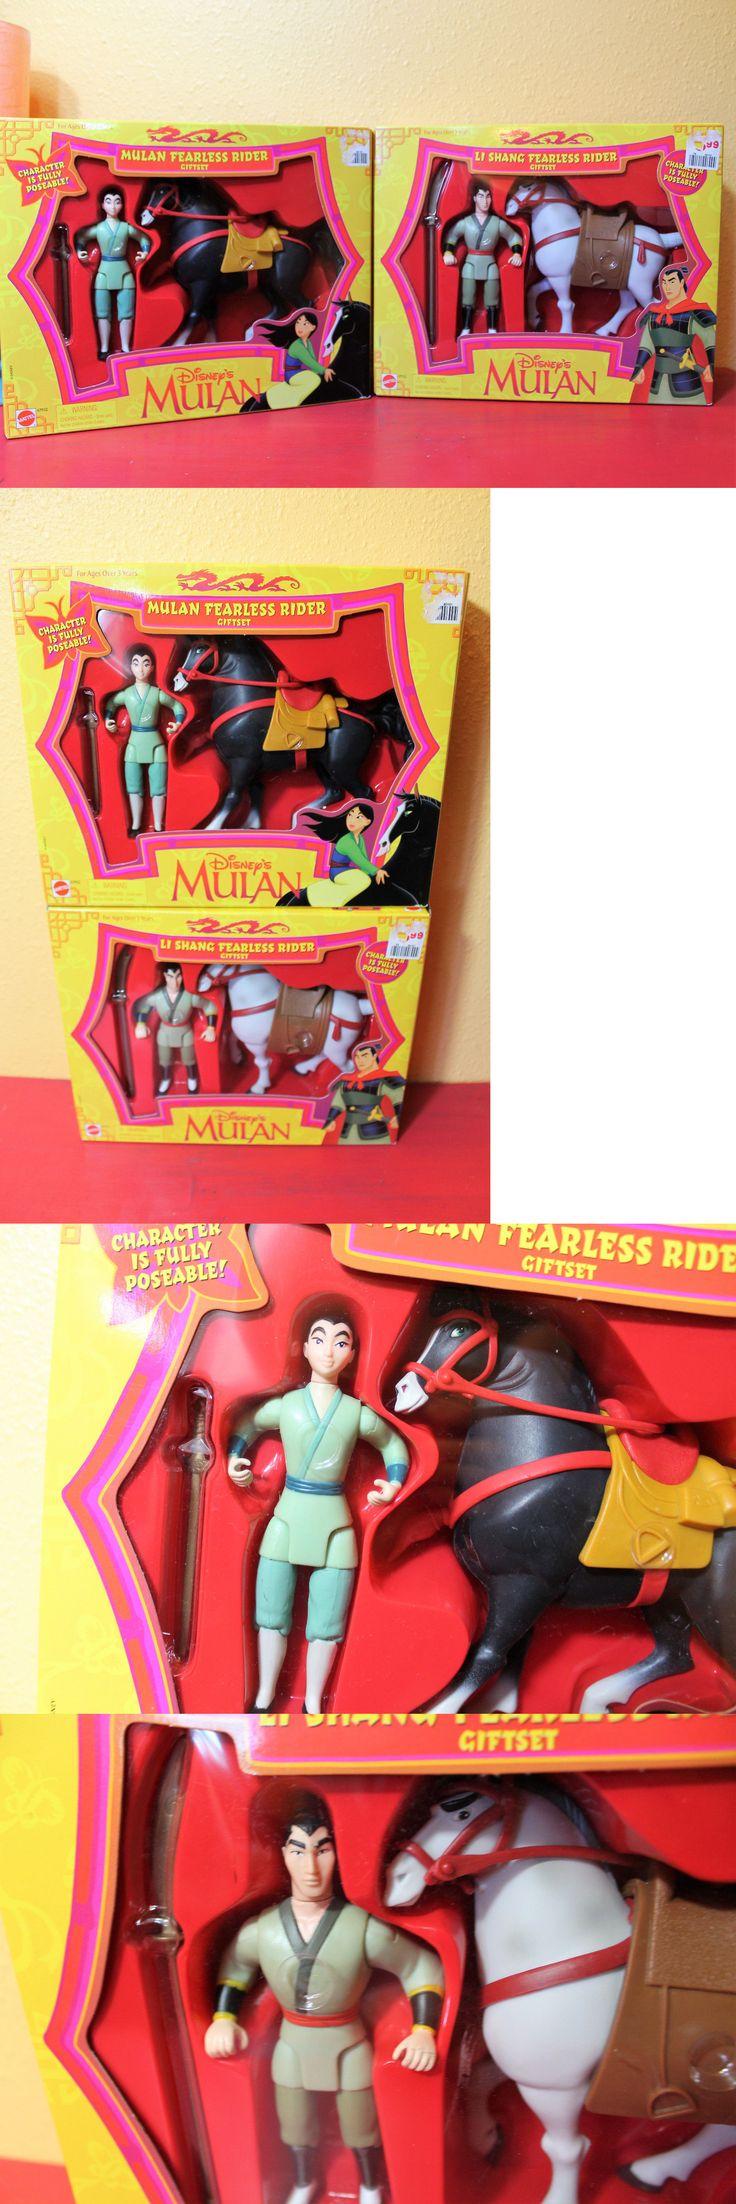 Disney Princesses 146030: Disney Mulan Li Shang Fearless Rider Horse Action Figure Doll Set Sealed Mattel -> BUY IT NOW ONLY: $46.95 on eBay!